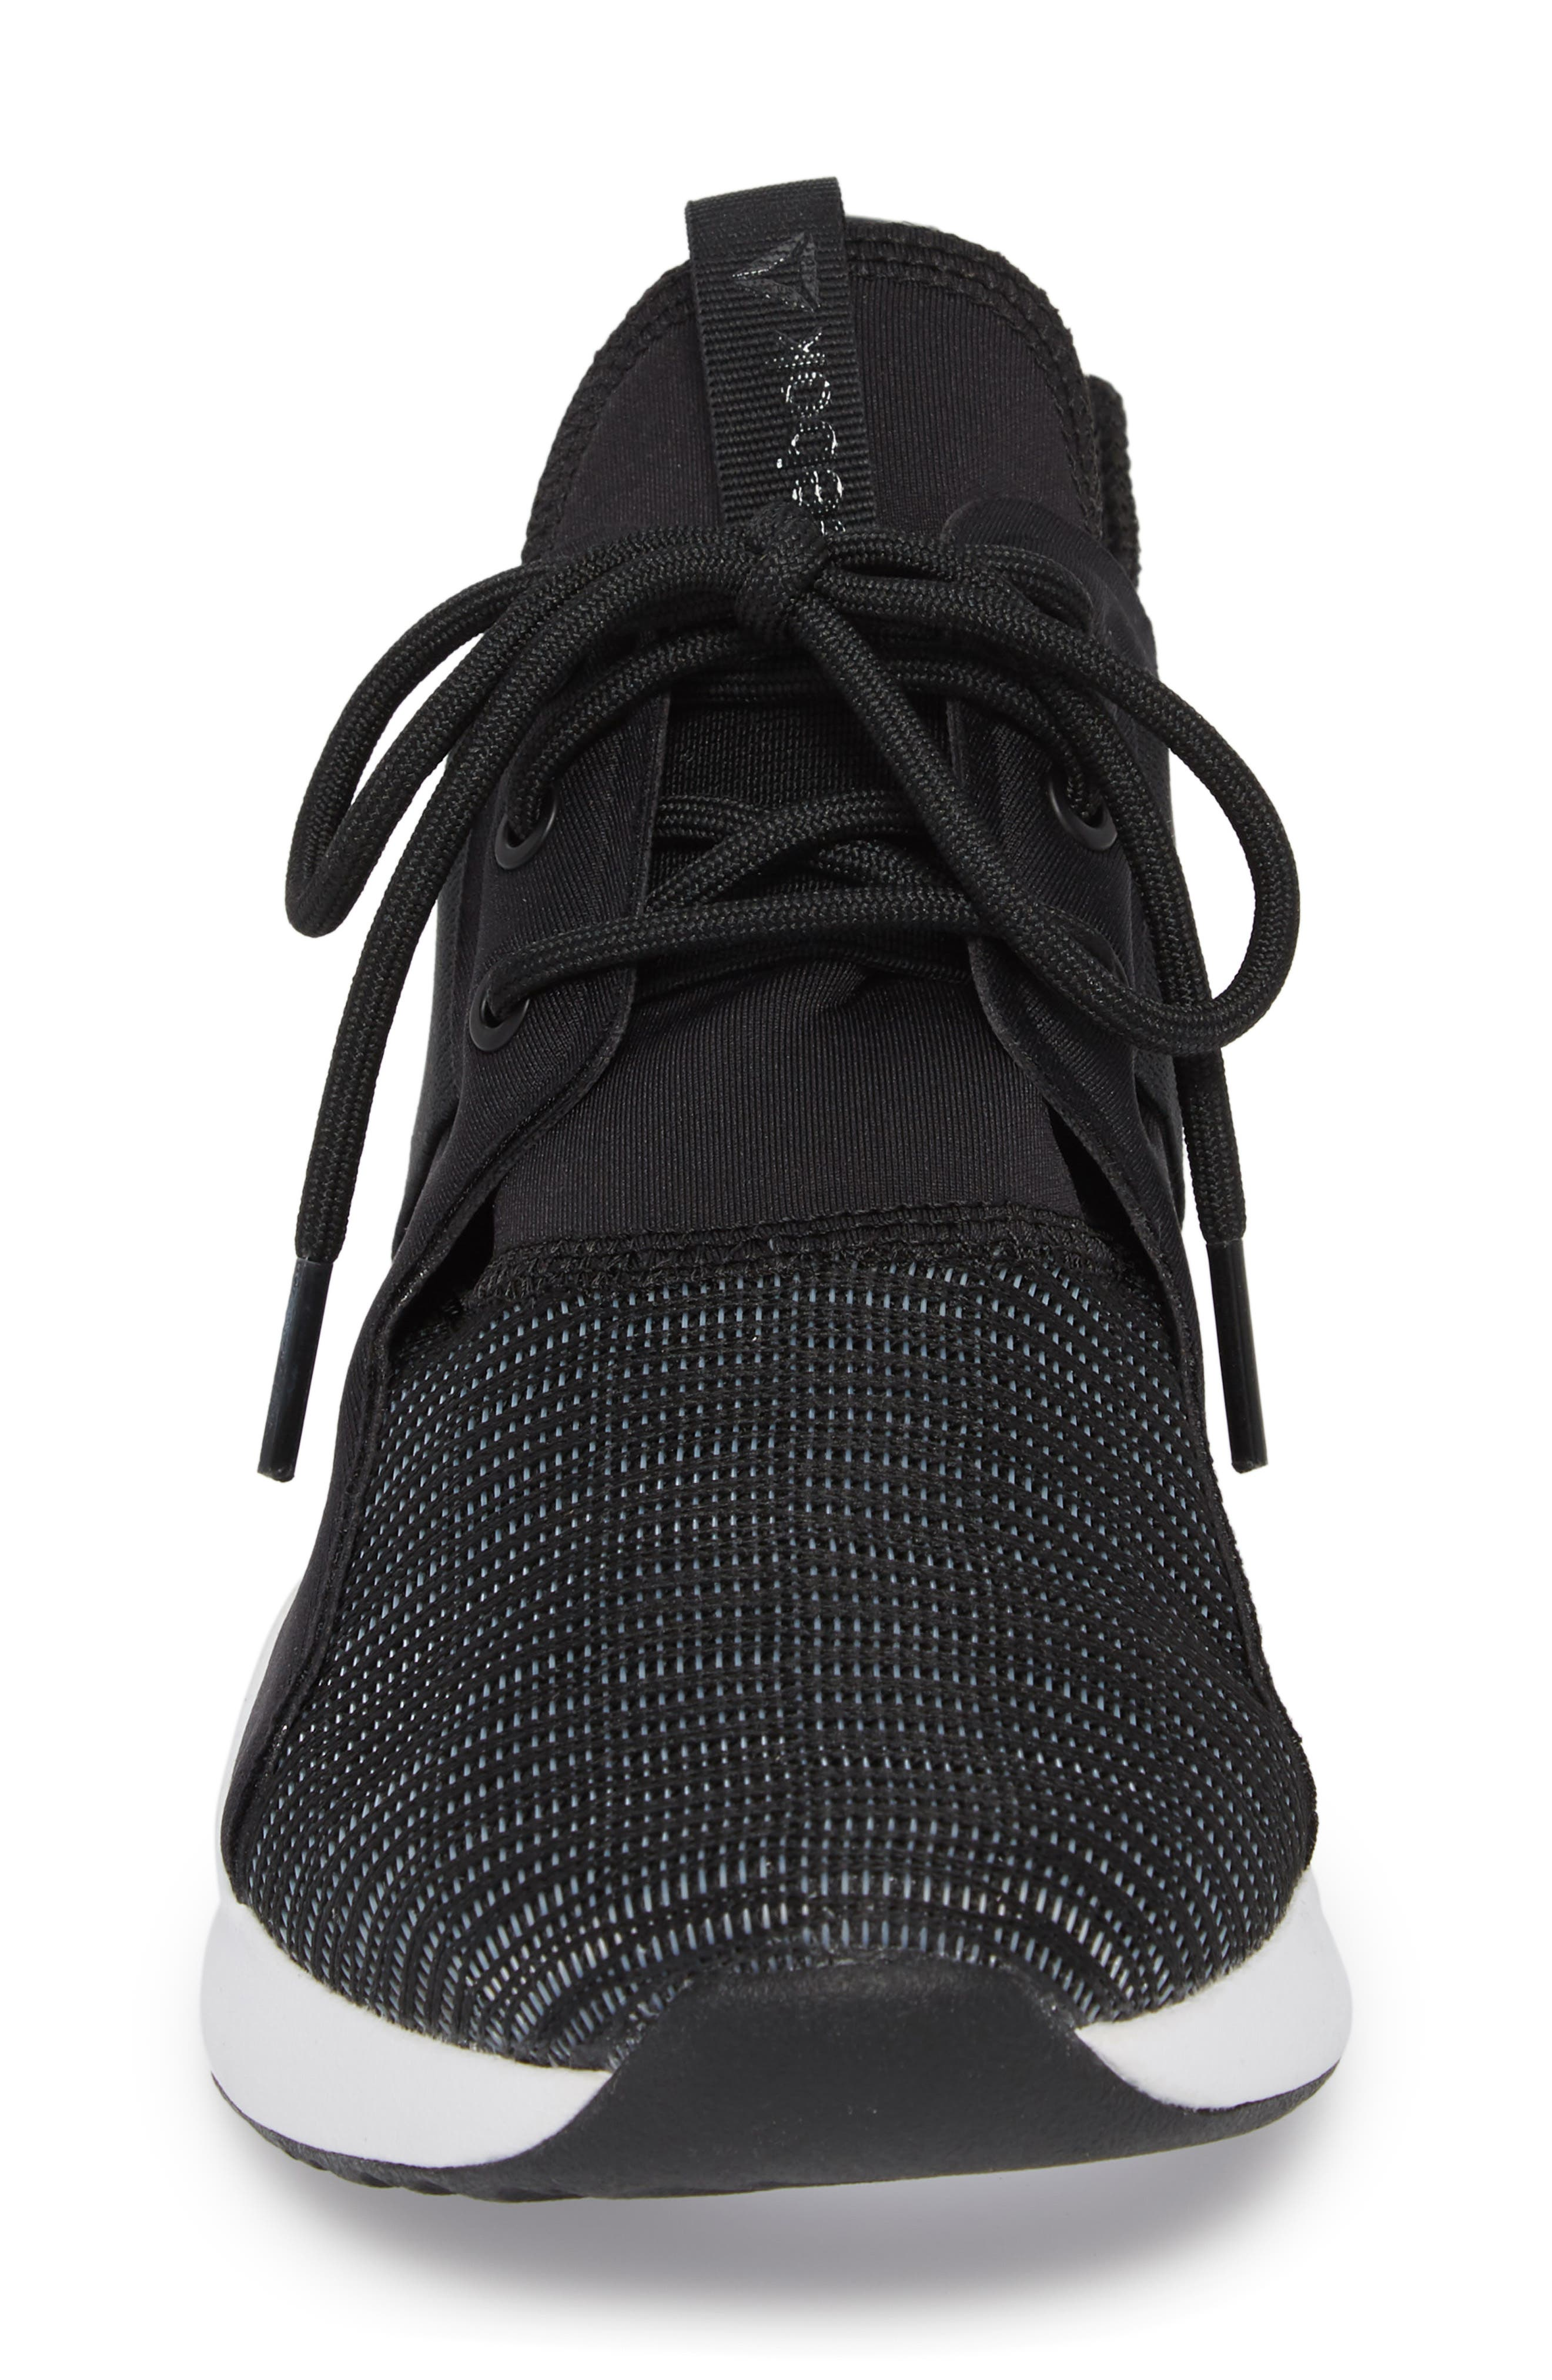 Guresu 1.0 High Top Sneaker,                             Alternate thumbnail 4, color,                             005